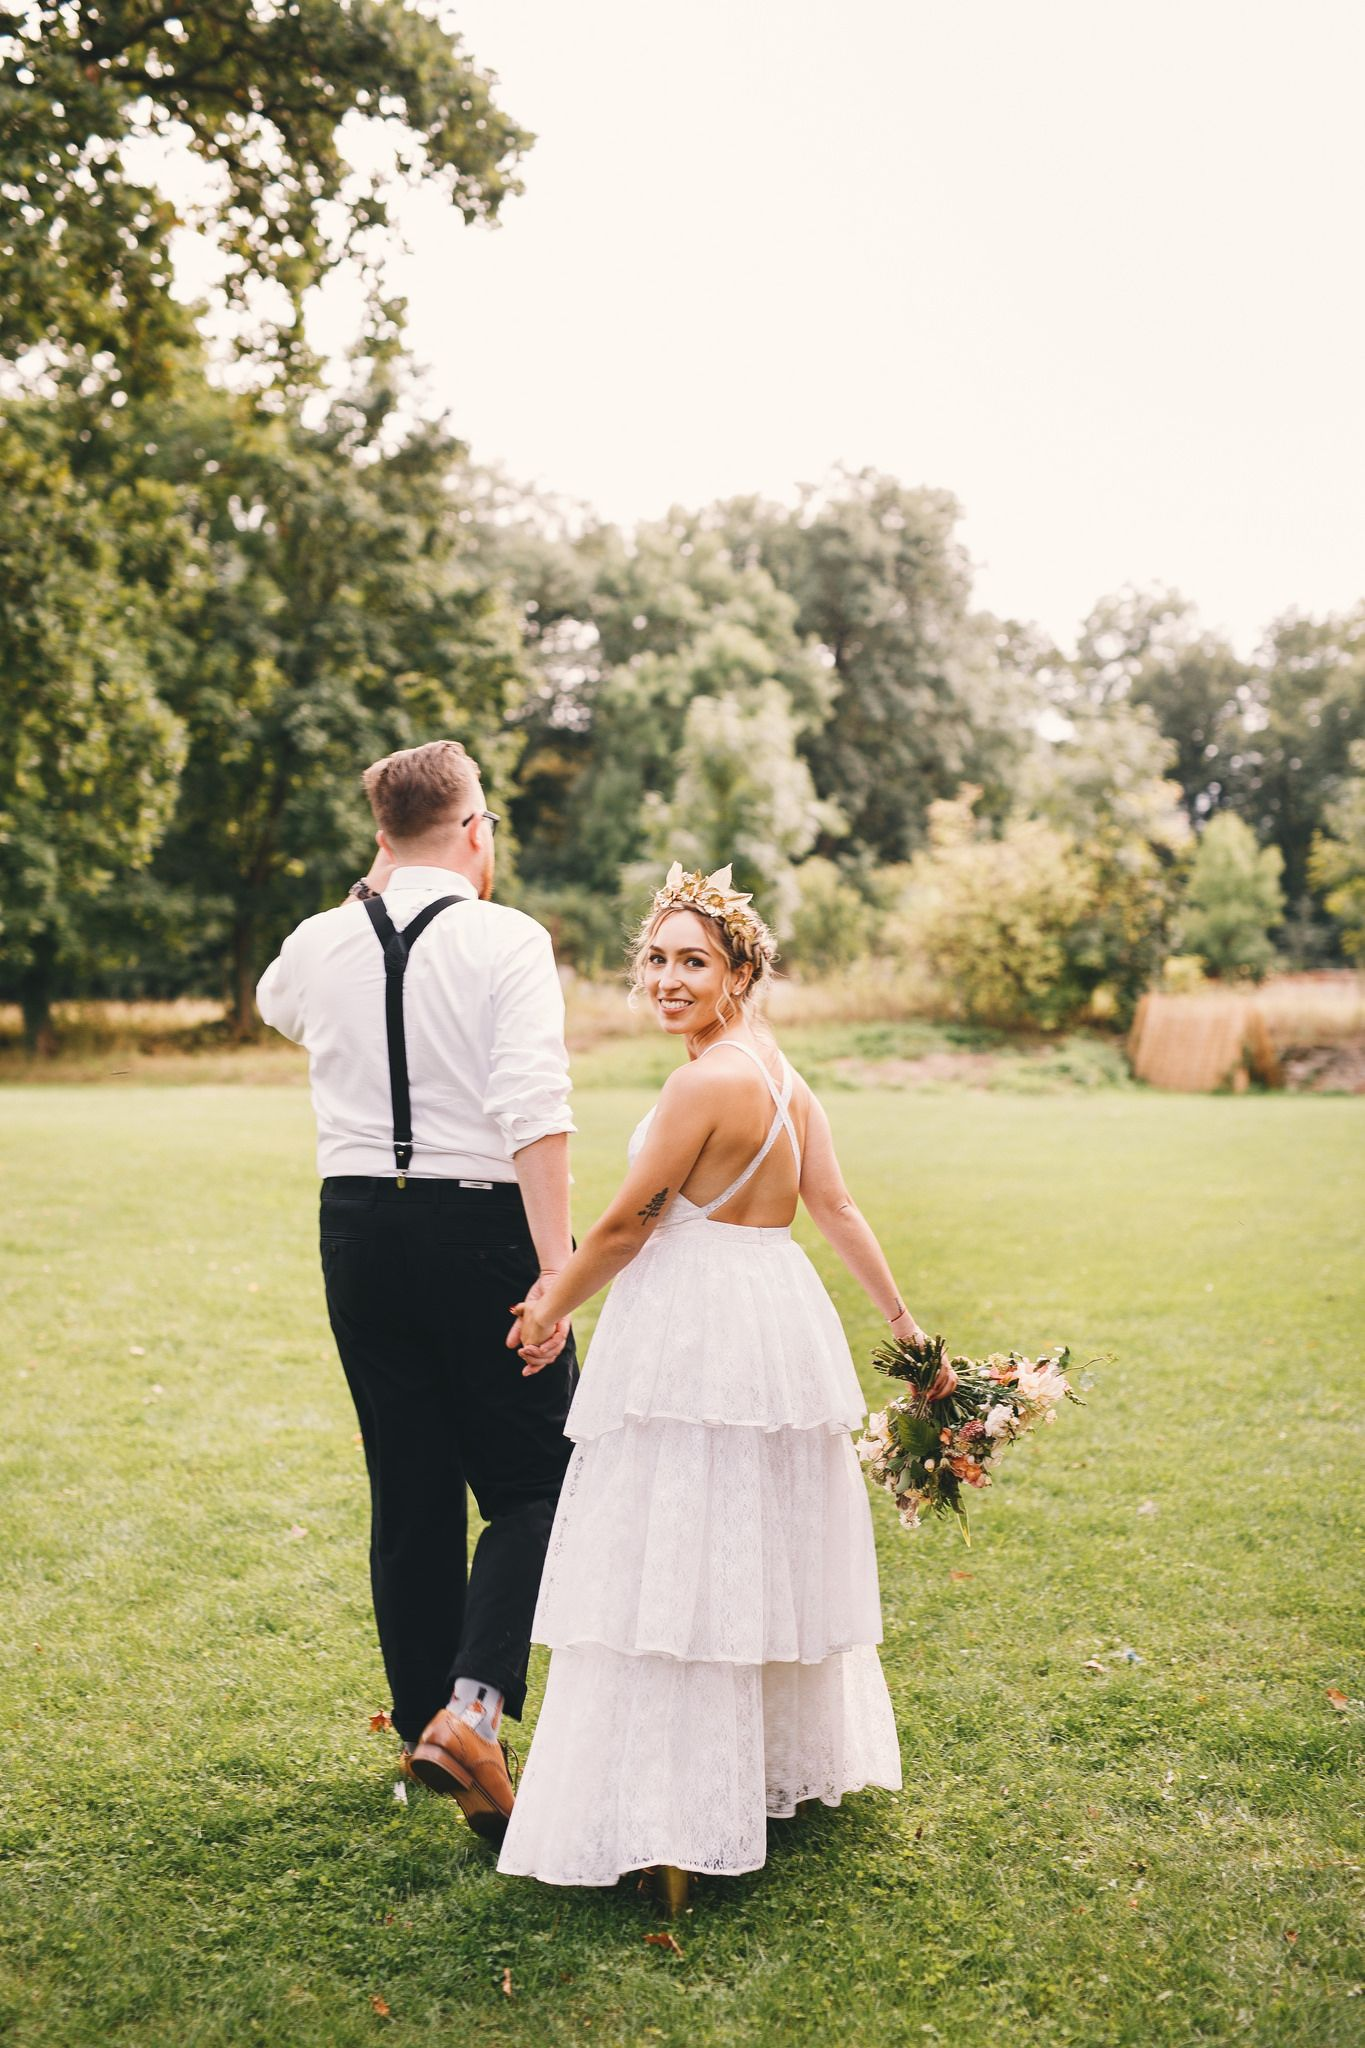 Styleofbecca wedding boho wedding diy wedding groom ruffled